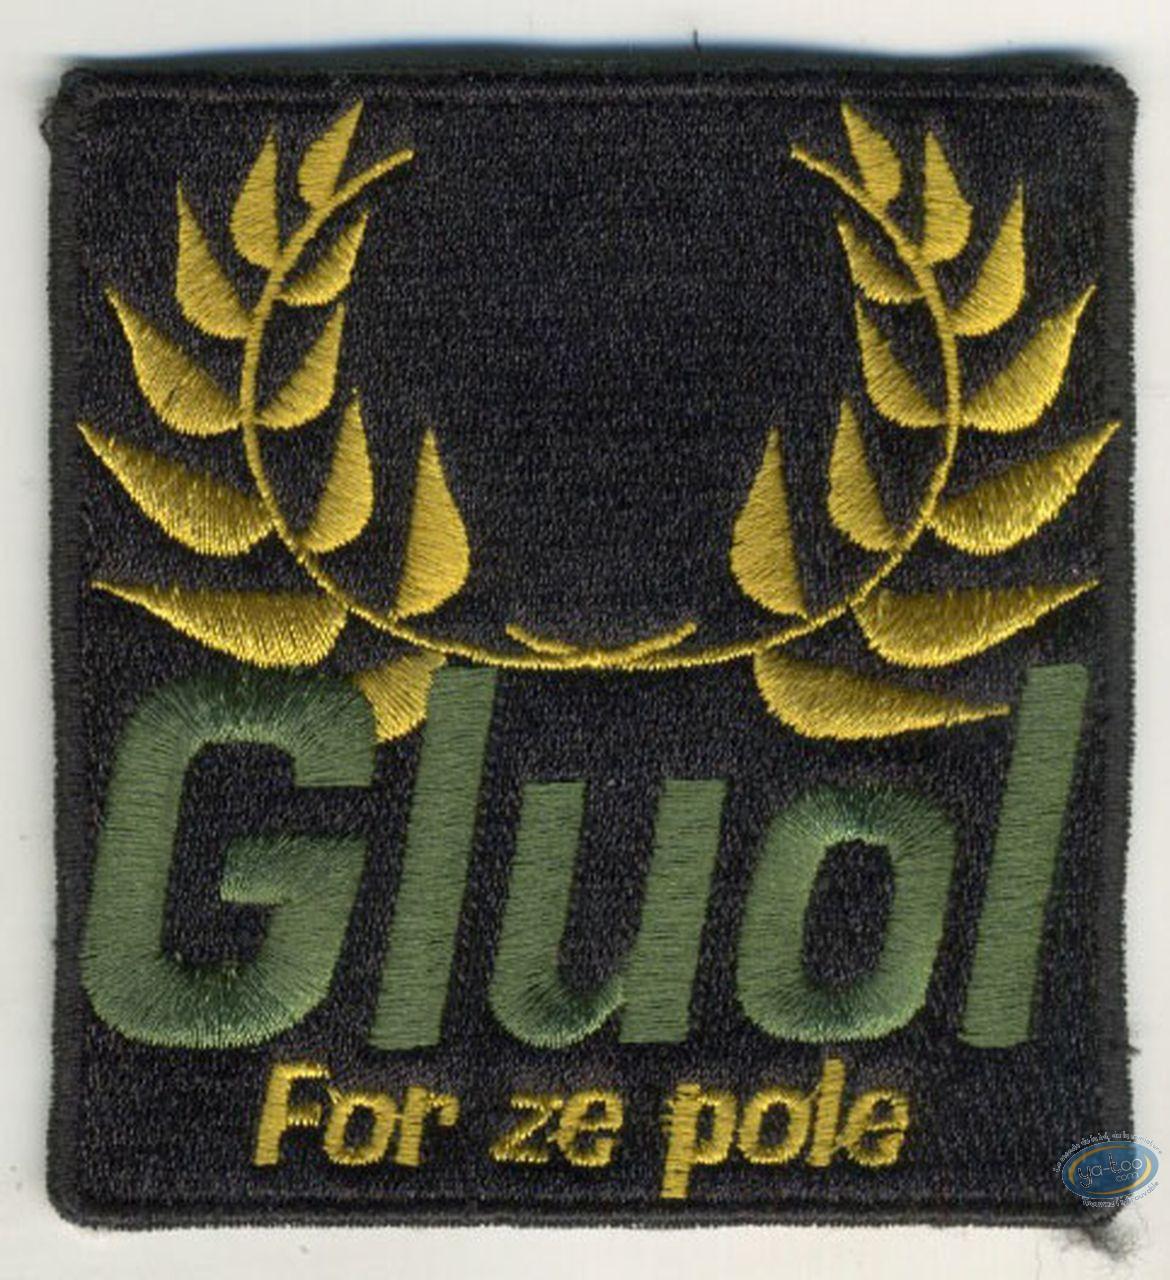 Clothes, Joe Bar Team : Embroidered badge, Joe Bar Team : Gluol